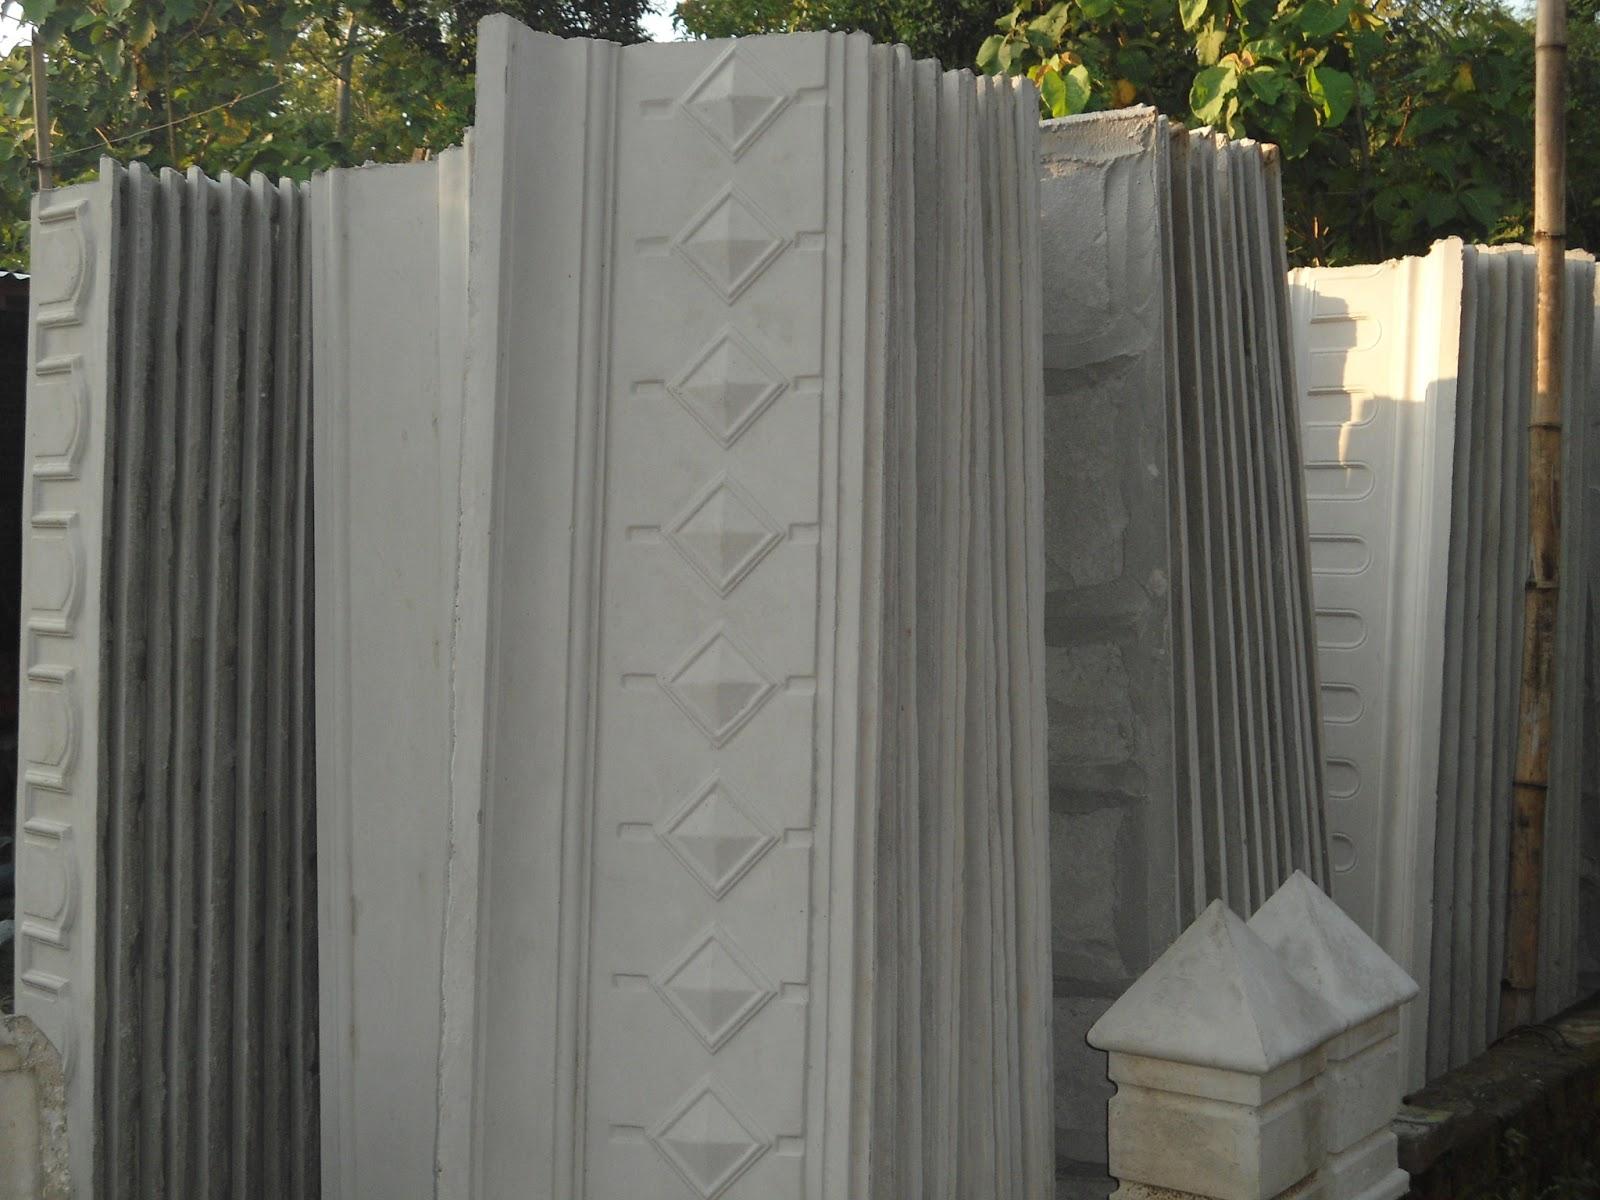 sanjaya profil beton motif listplang cetakan